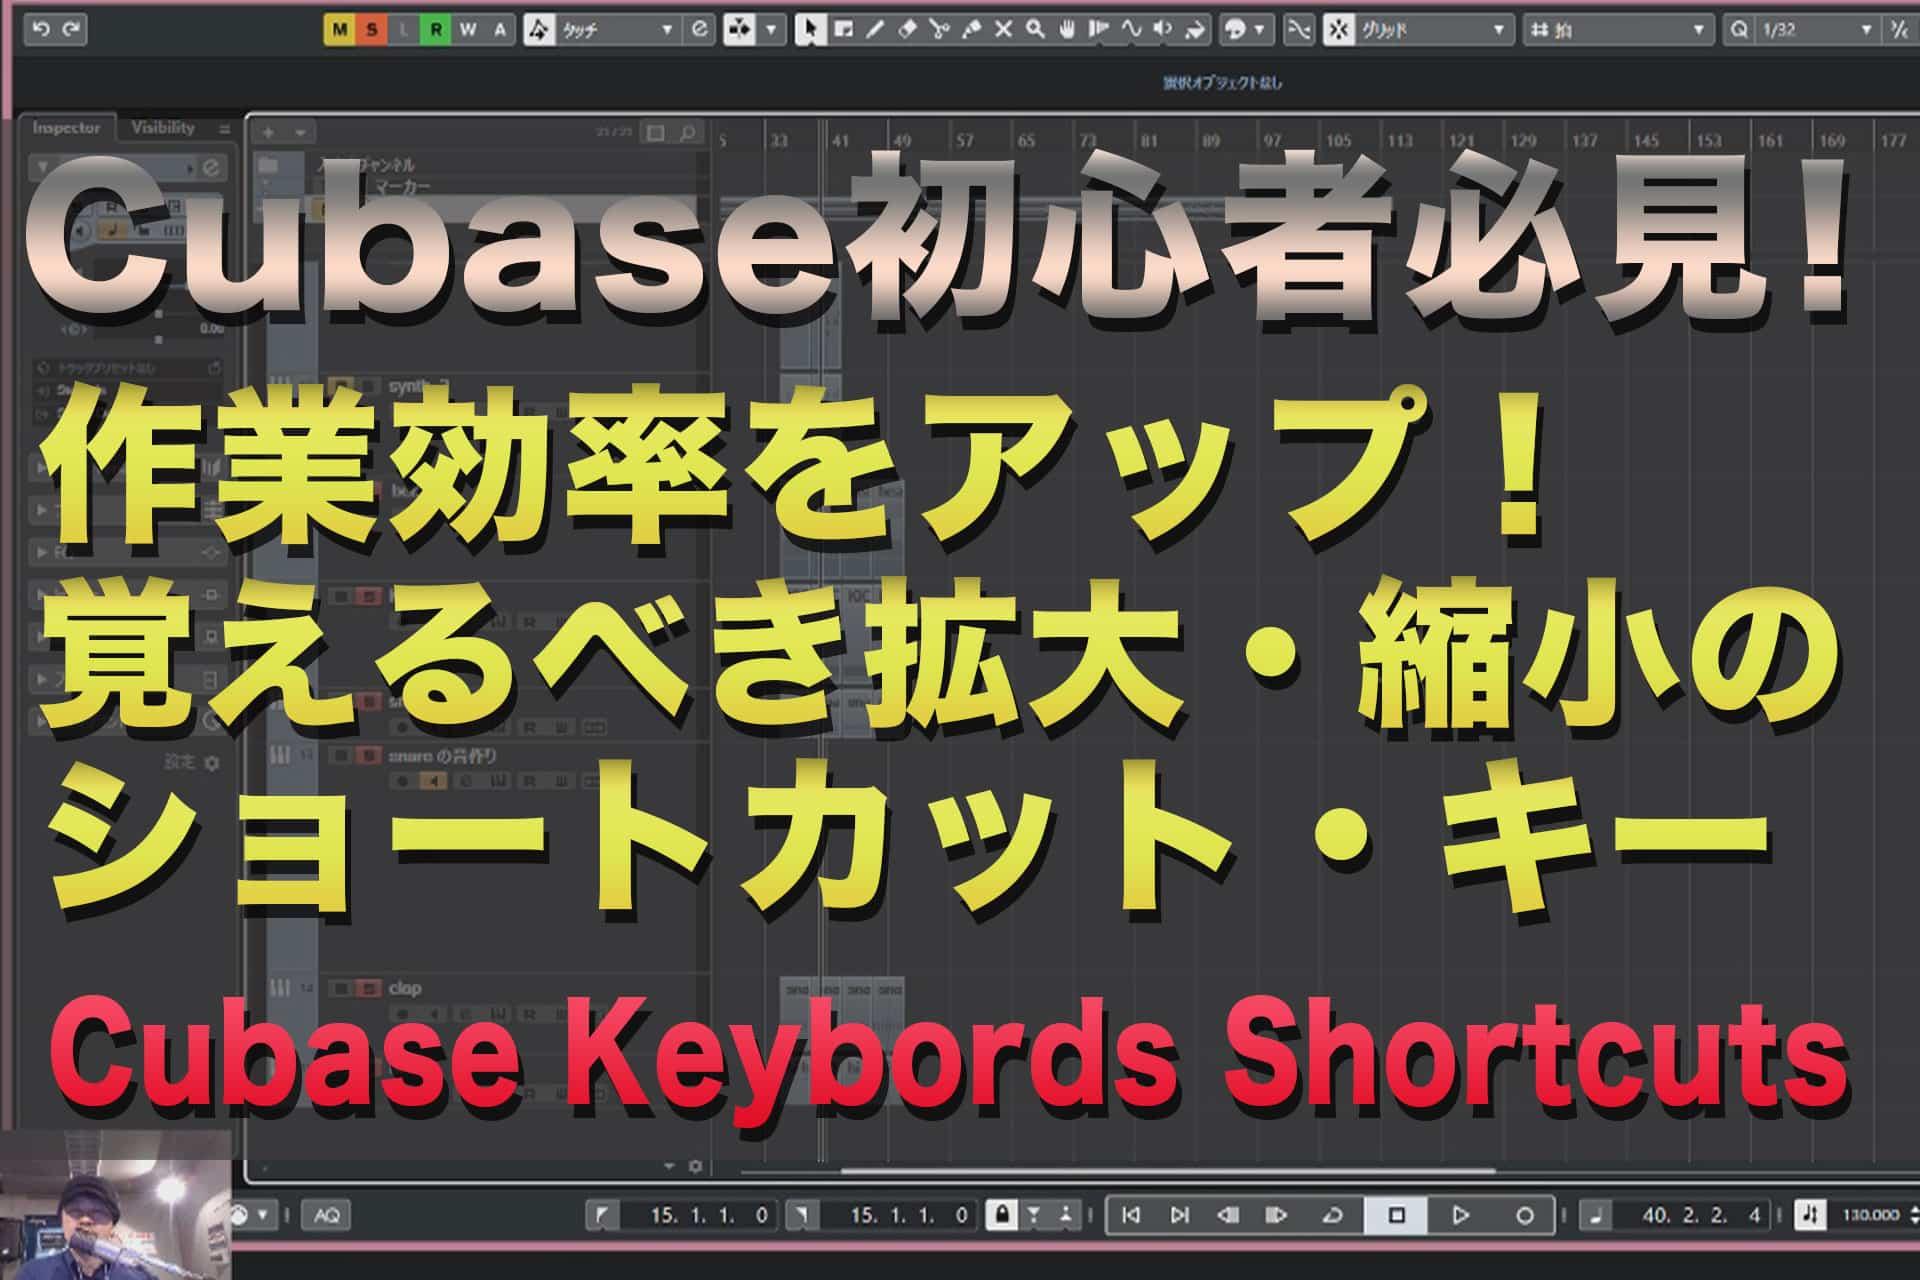 【cubase初心者向け動画解説!】作業効率をアップさせる拡大・縮小のショートカット・キー | Cubase Keybords Shortcuts